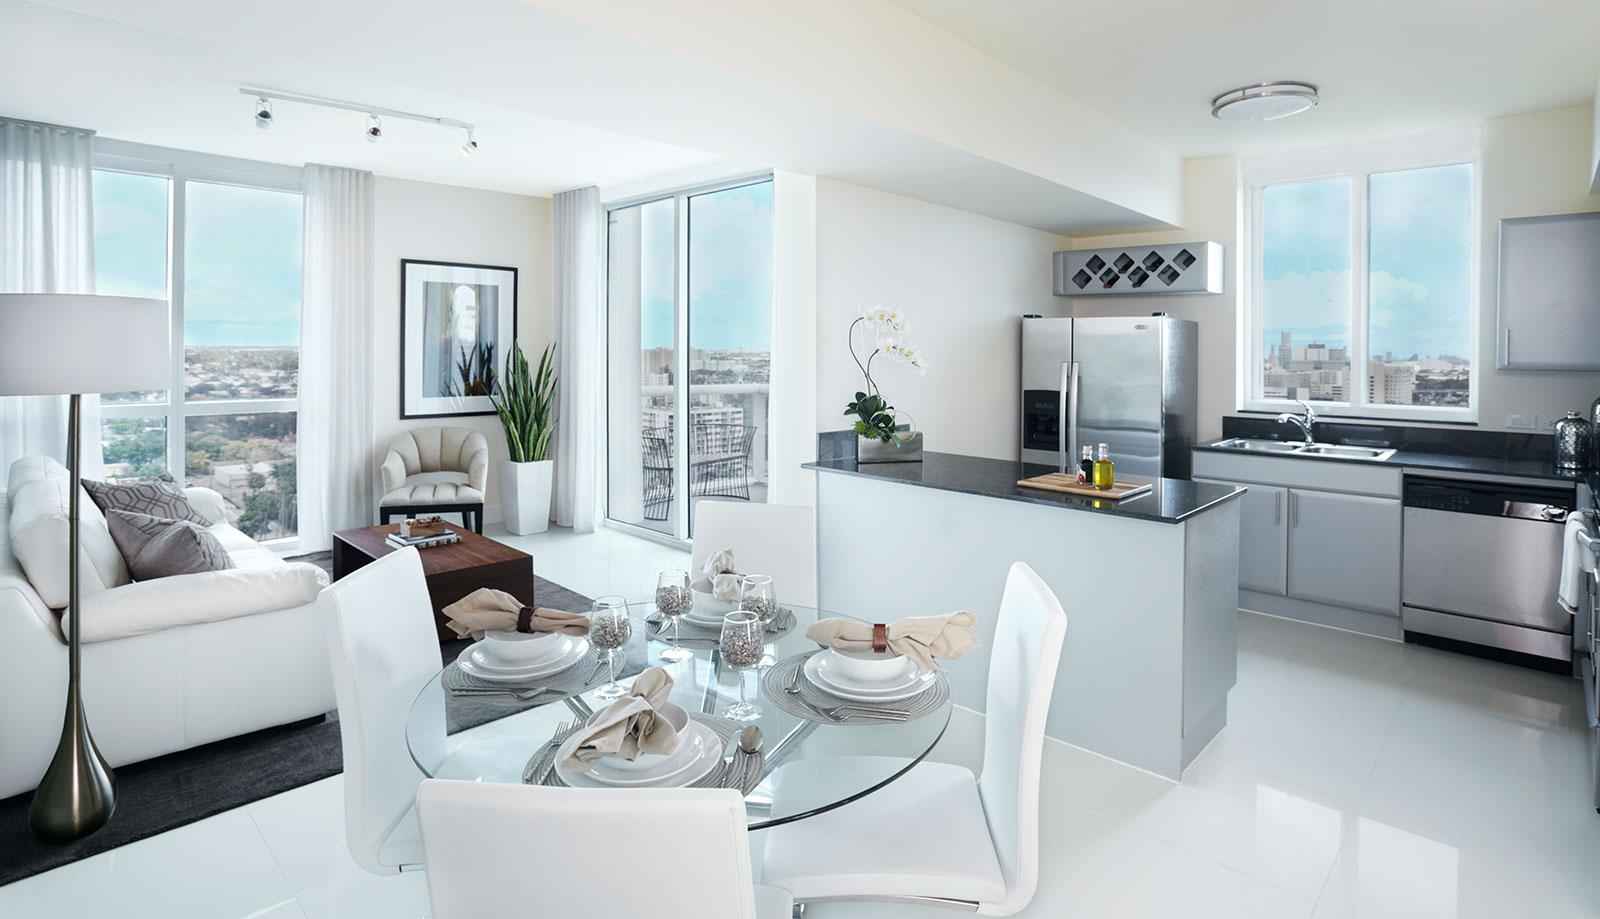 Imóveis em Miami - Terrazas